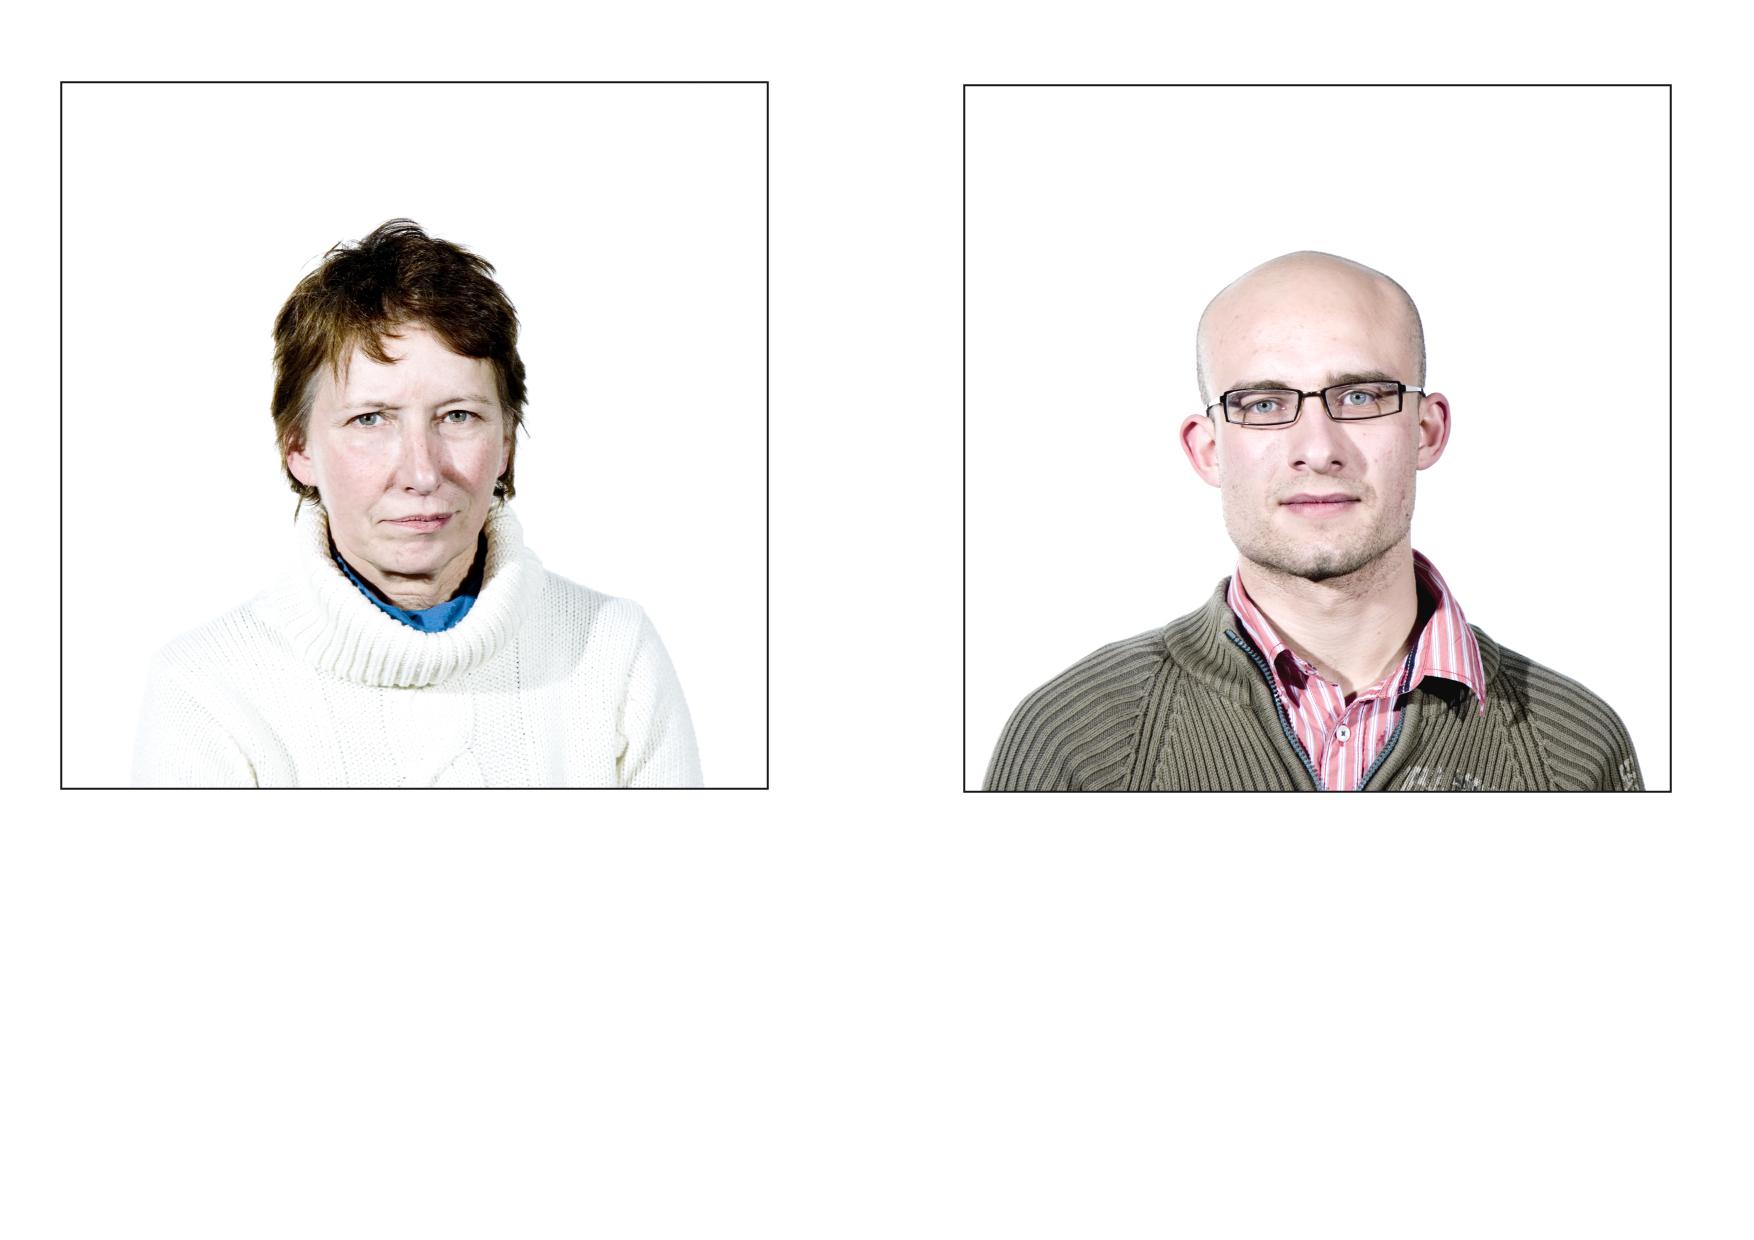 portraits-1-p2-3.jpg